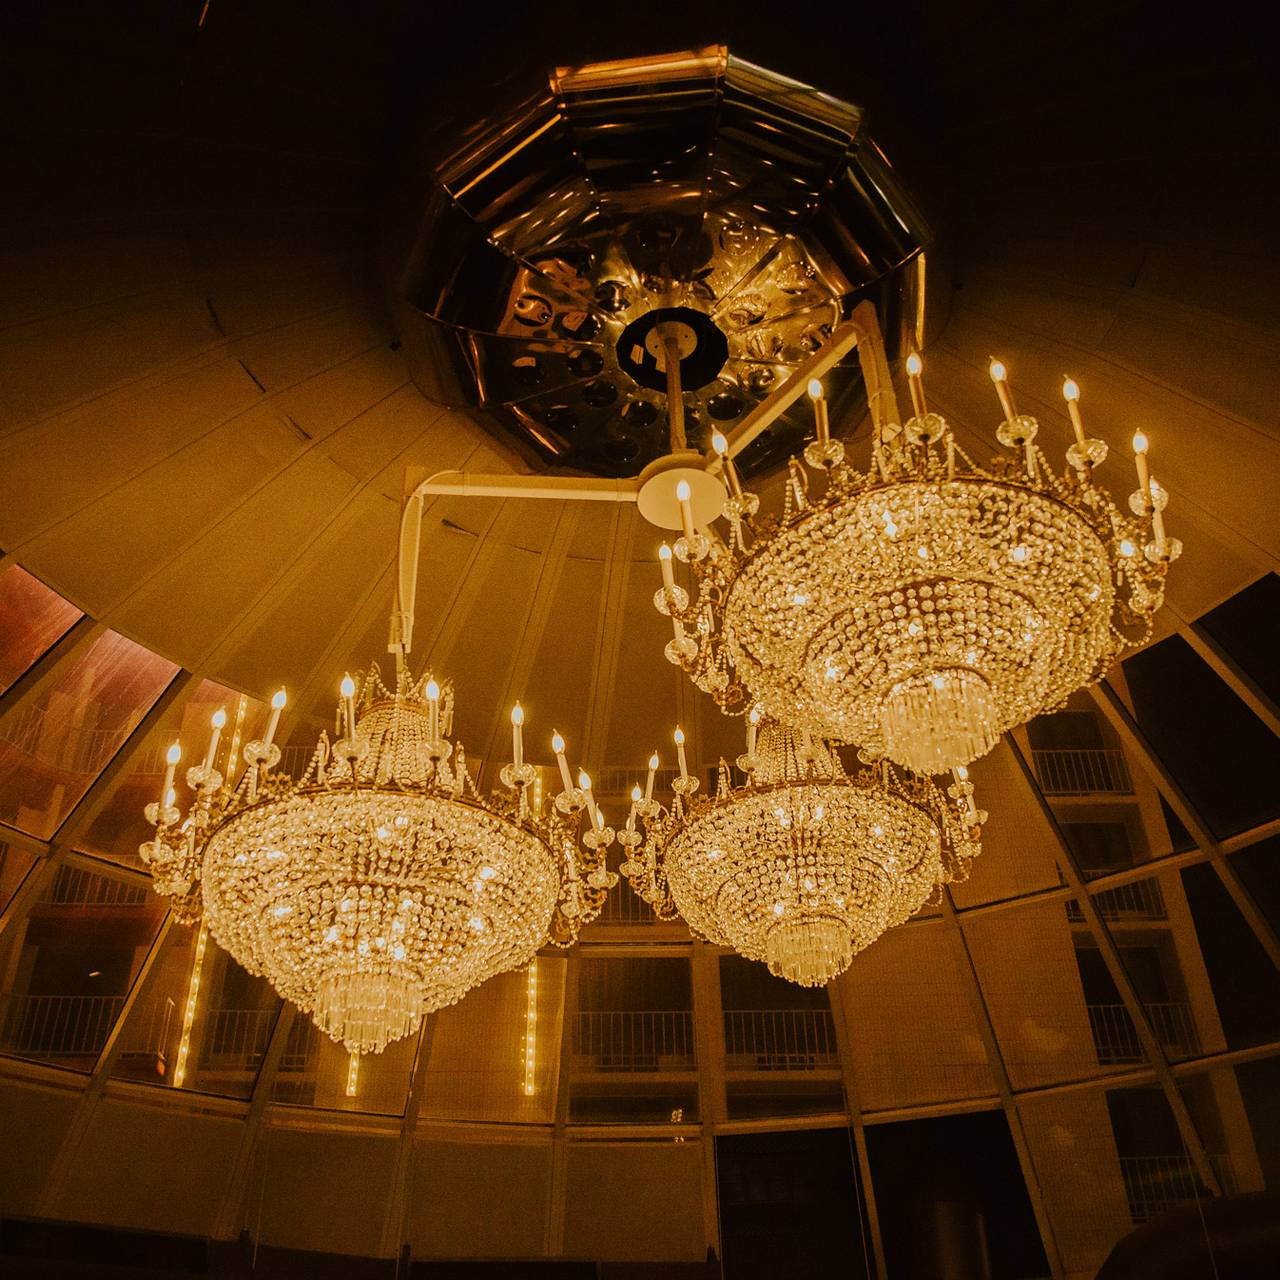 Oscar S Steakhouse At The Plaza Hotel Casino Restaurant Las Vegas Nv Opentable